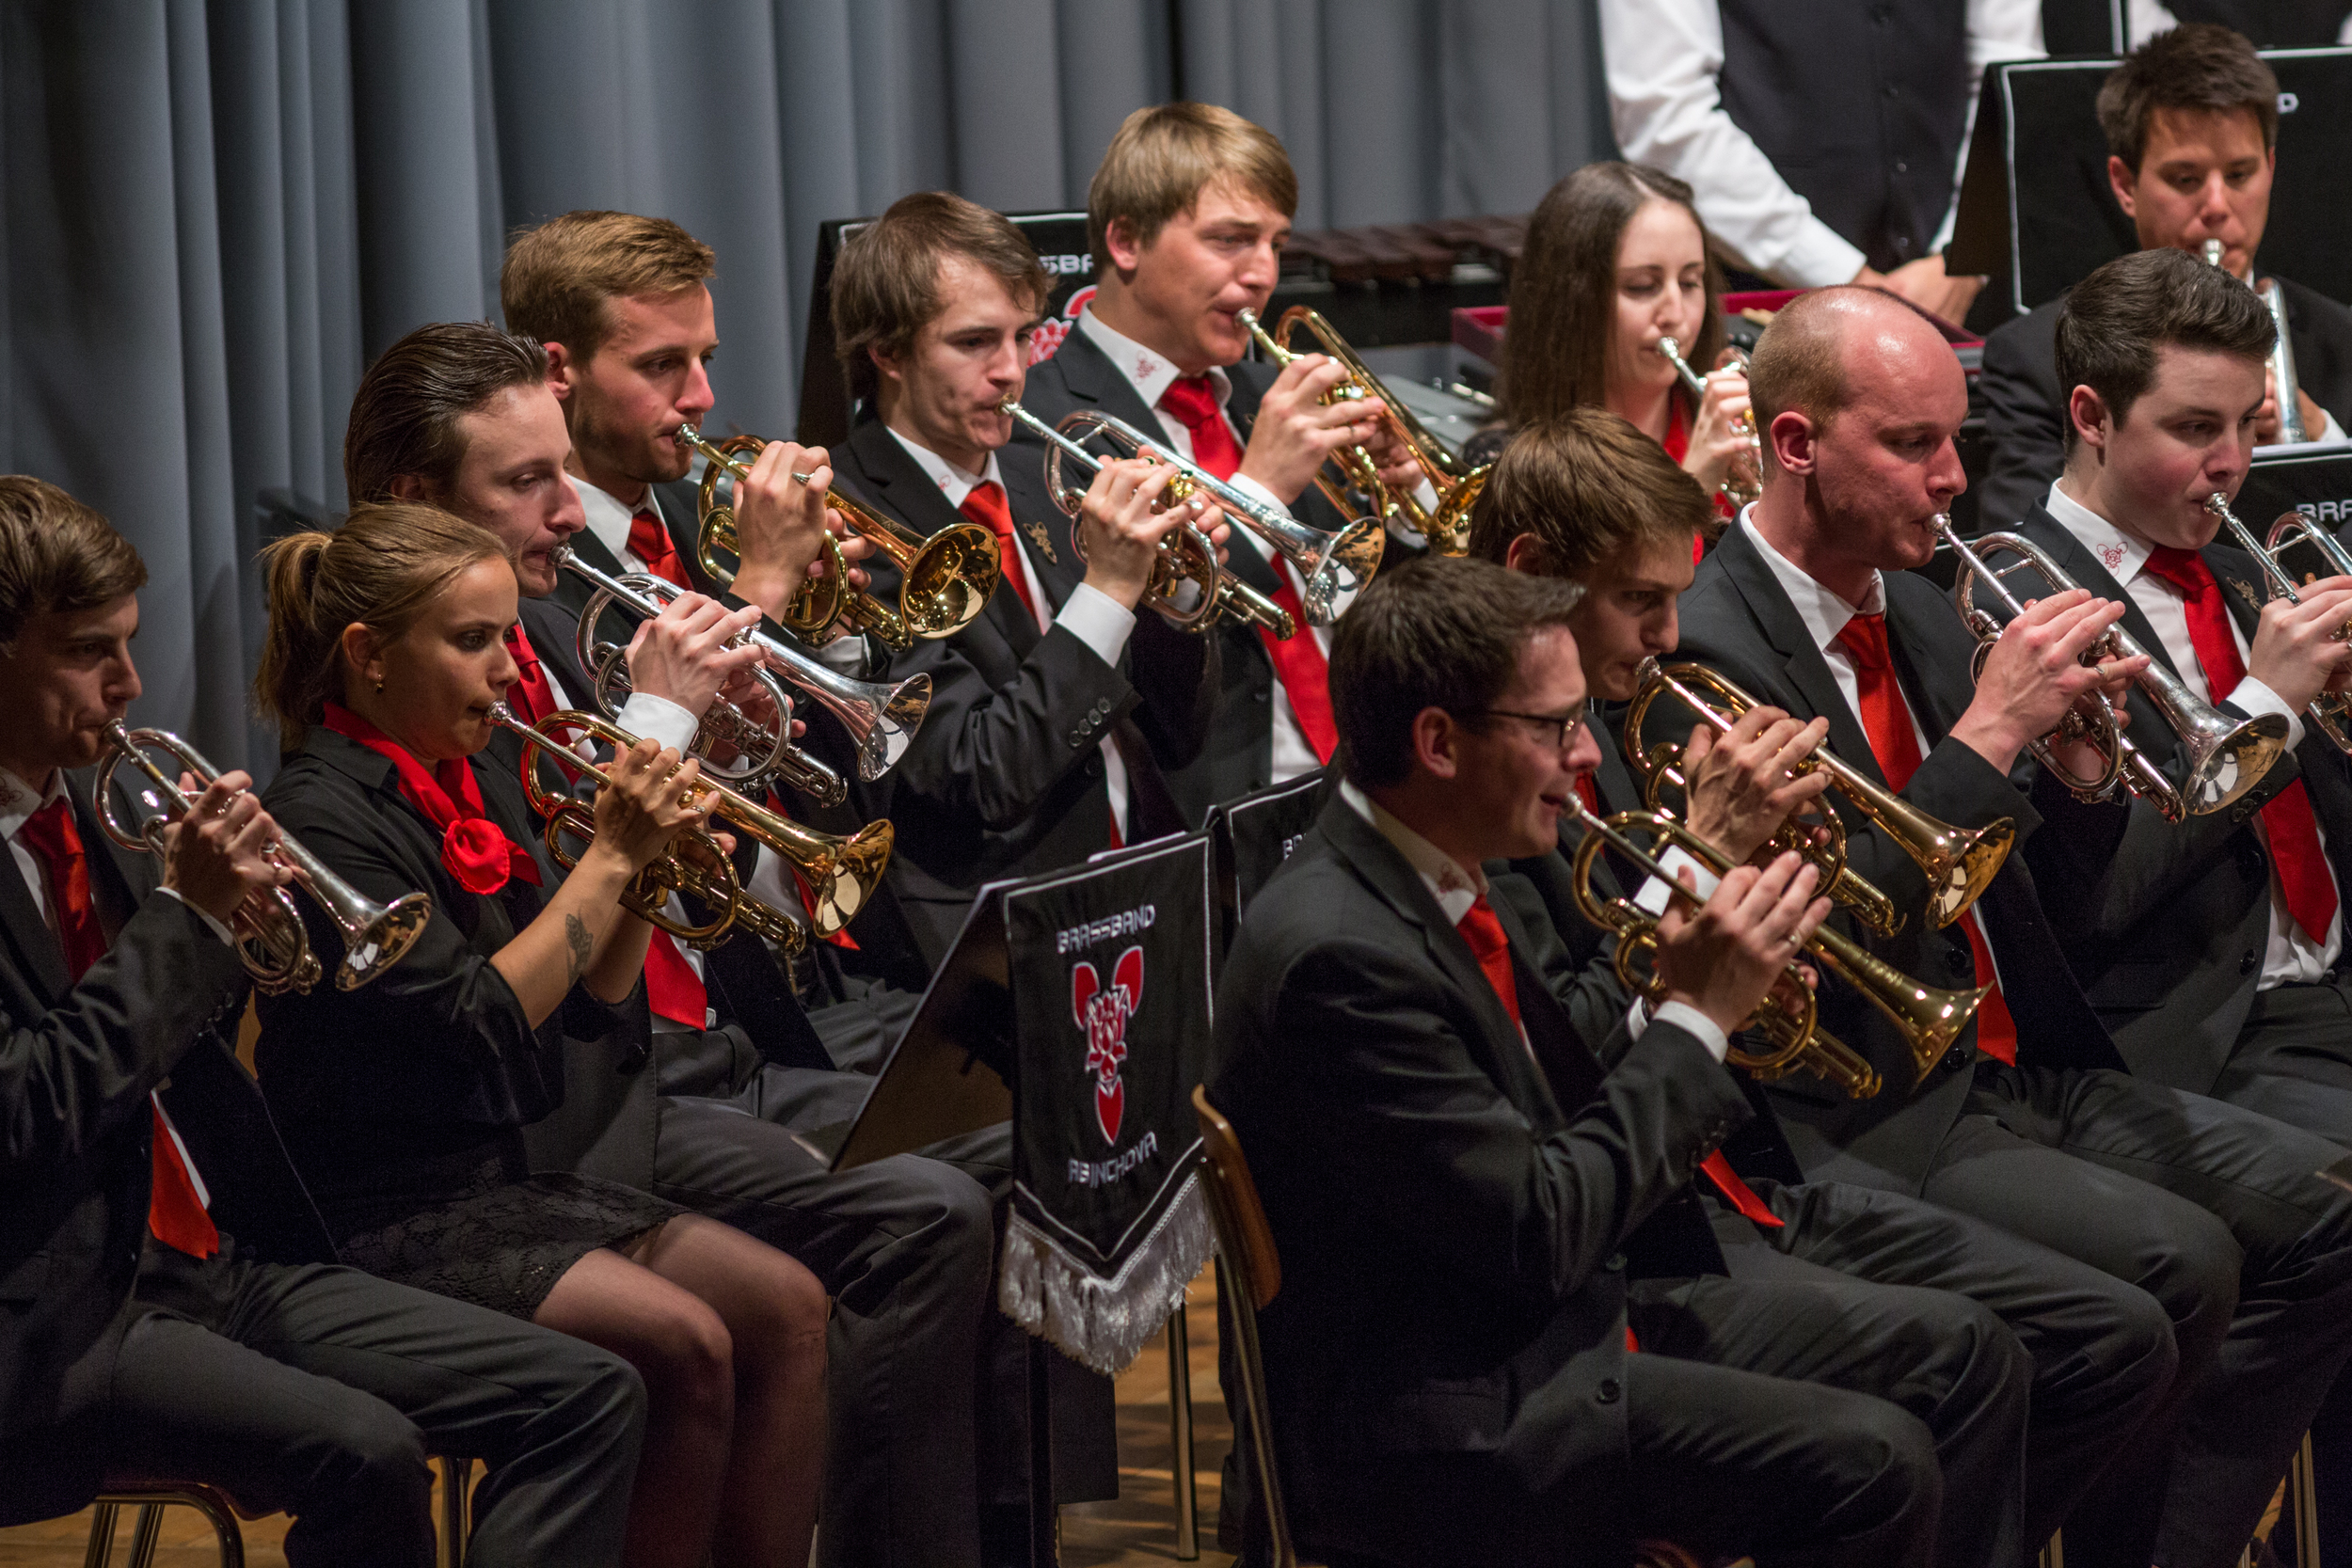 20160521_Brassband Abinchova_Jubila¦êumskonzert im Pfarreiheim in Ebikon_25.jpg